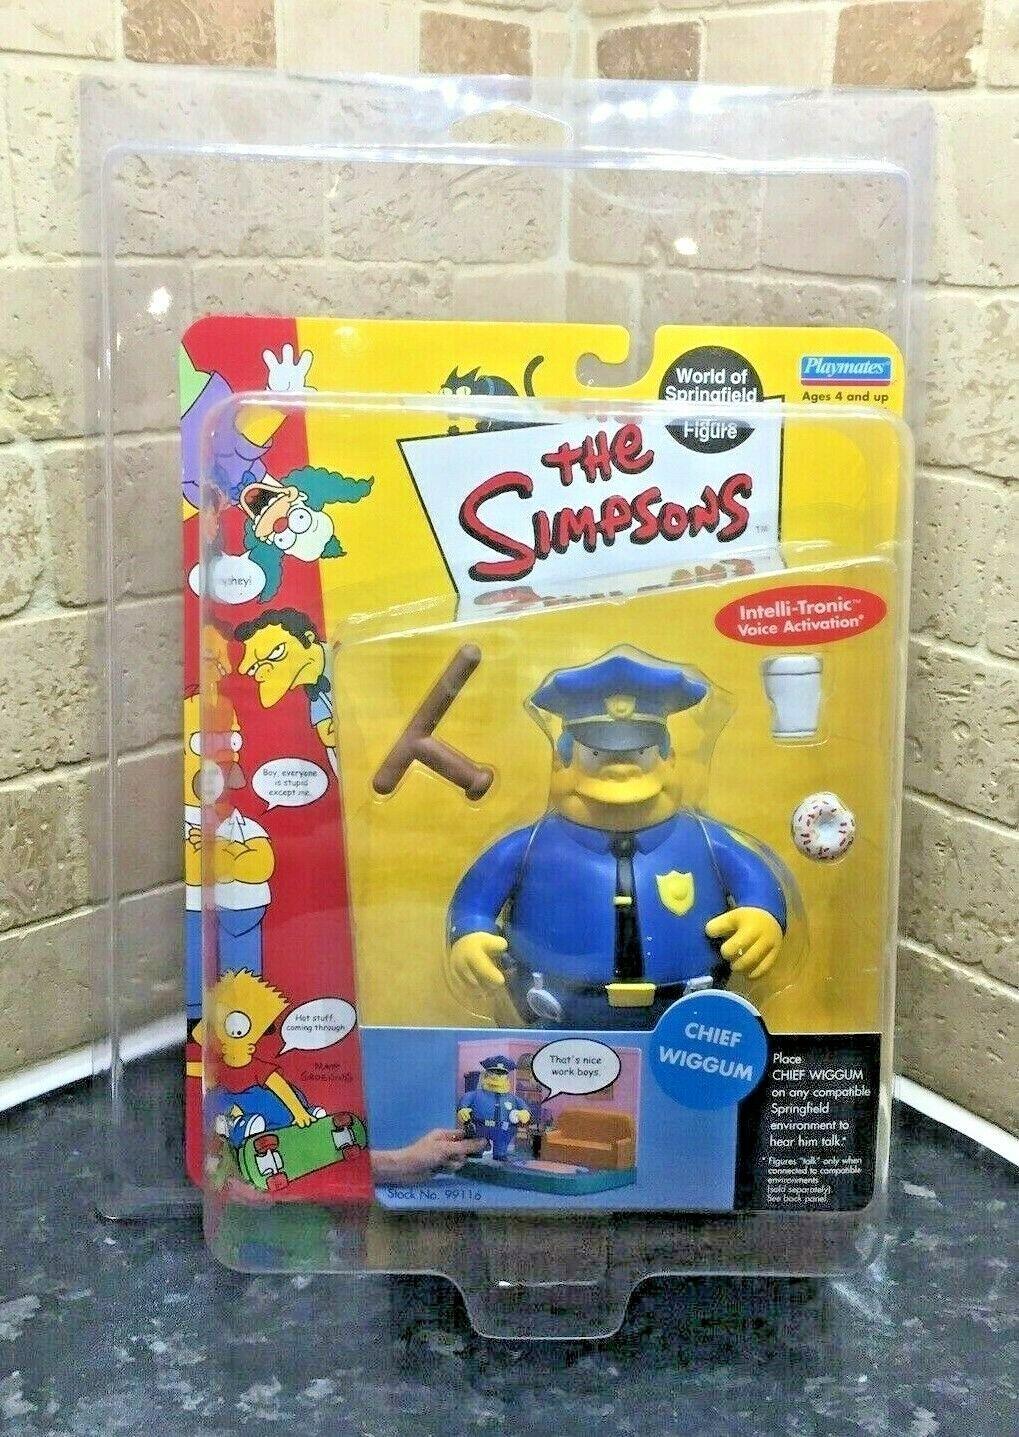 Polischef Wiggum 2000 Simpsons Figur WOS värld of Simpsons Pro Cased